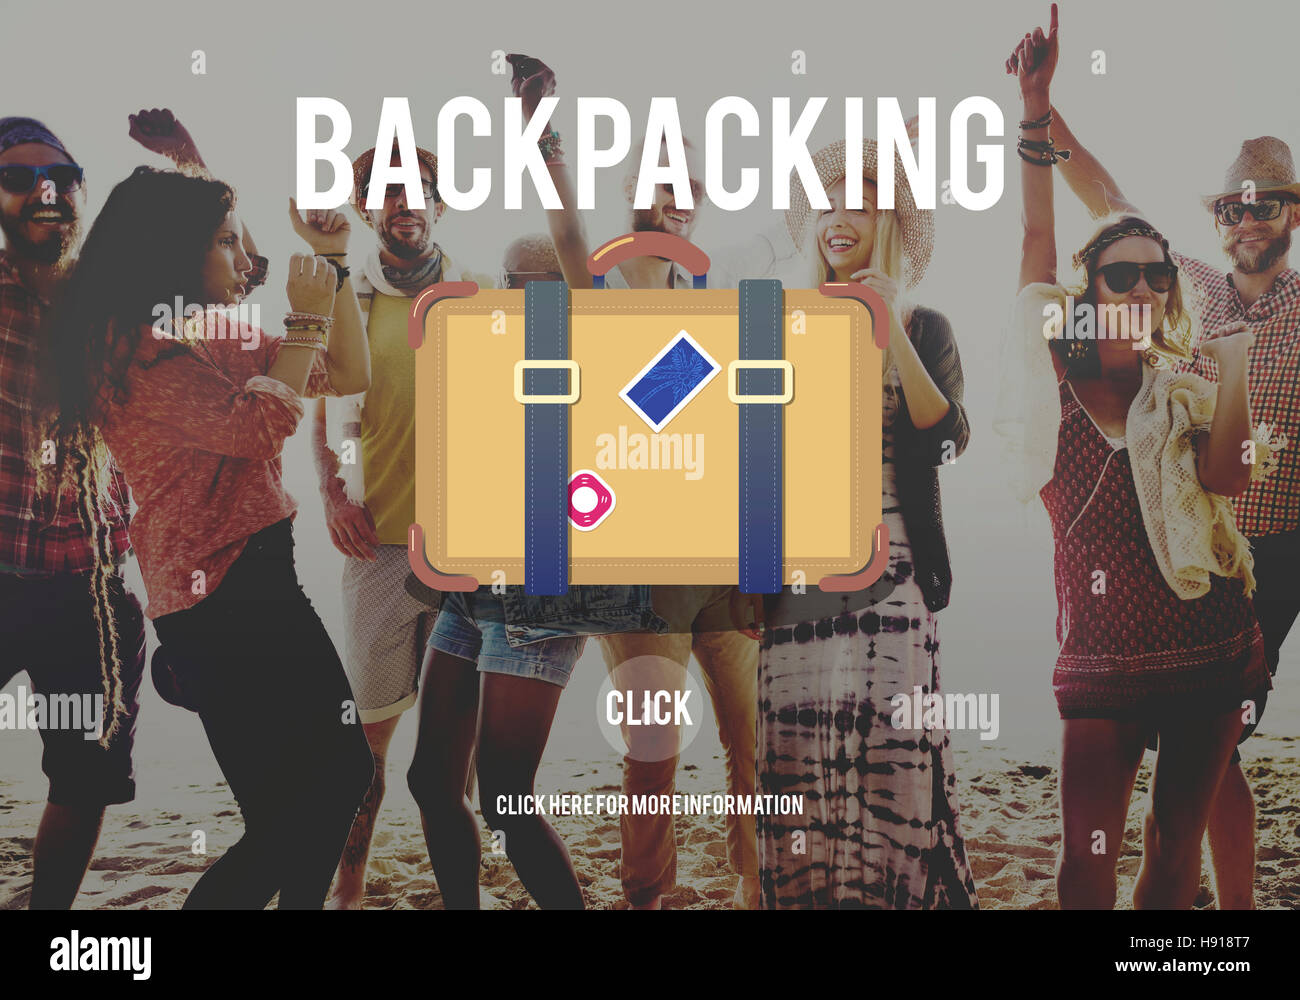 Adventure Backpacking Travel Destination Wander Concept - Stock Image